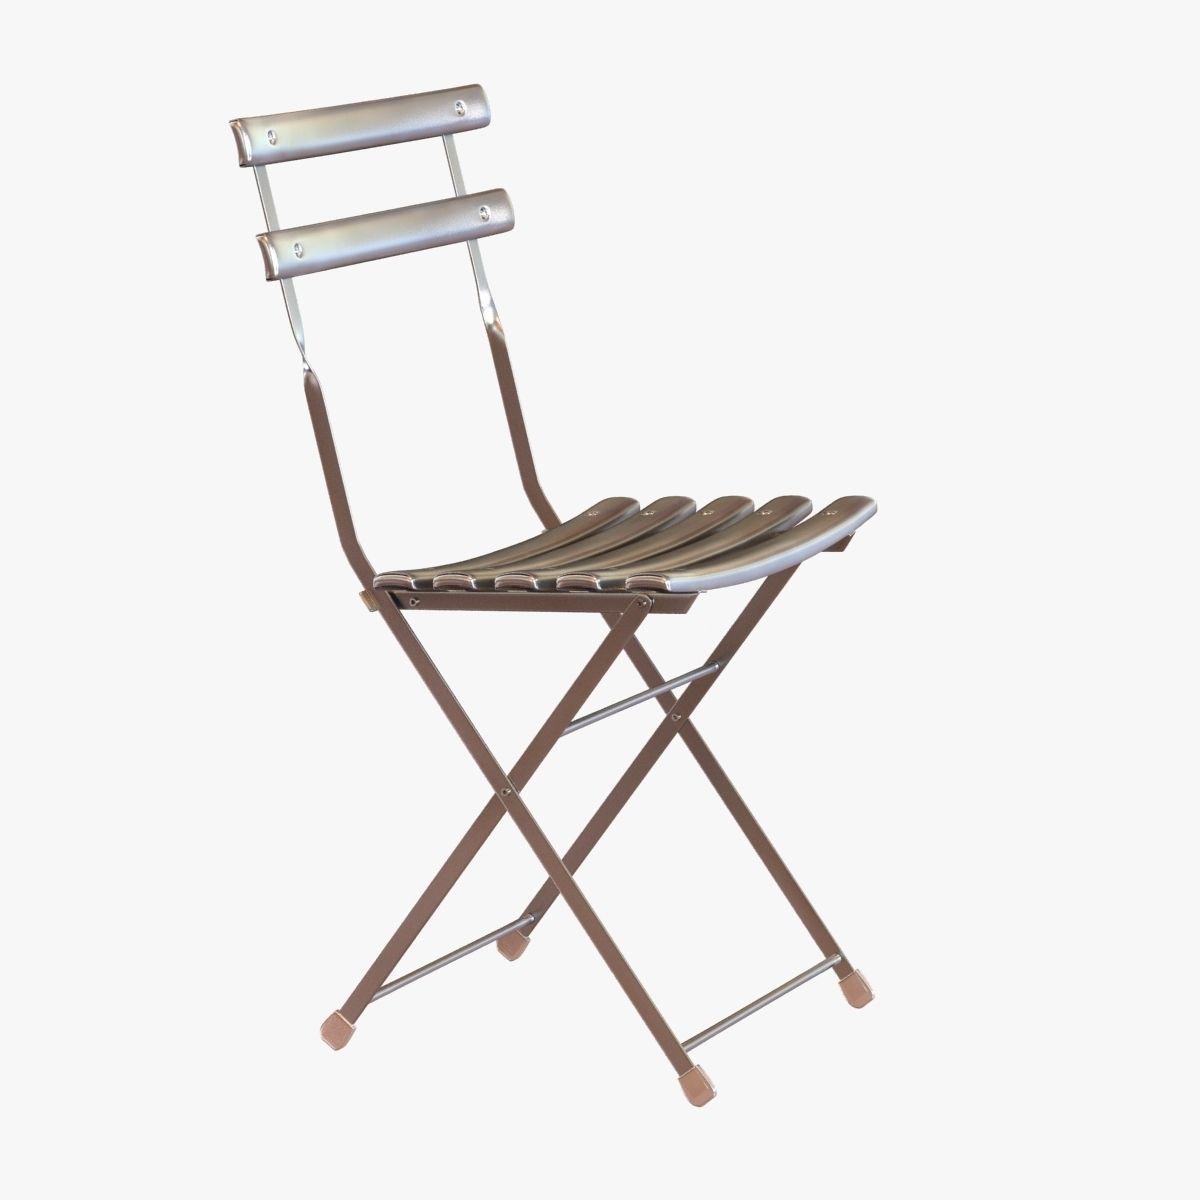 Dwr Arc En Ciel Folding Chair 3d Model Max Obj 3ds Fbx Mtl 1 ...